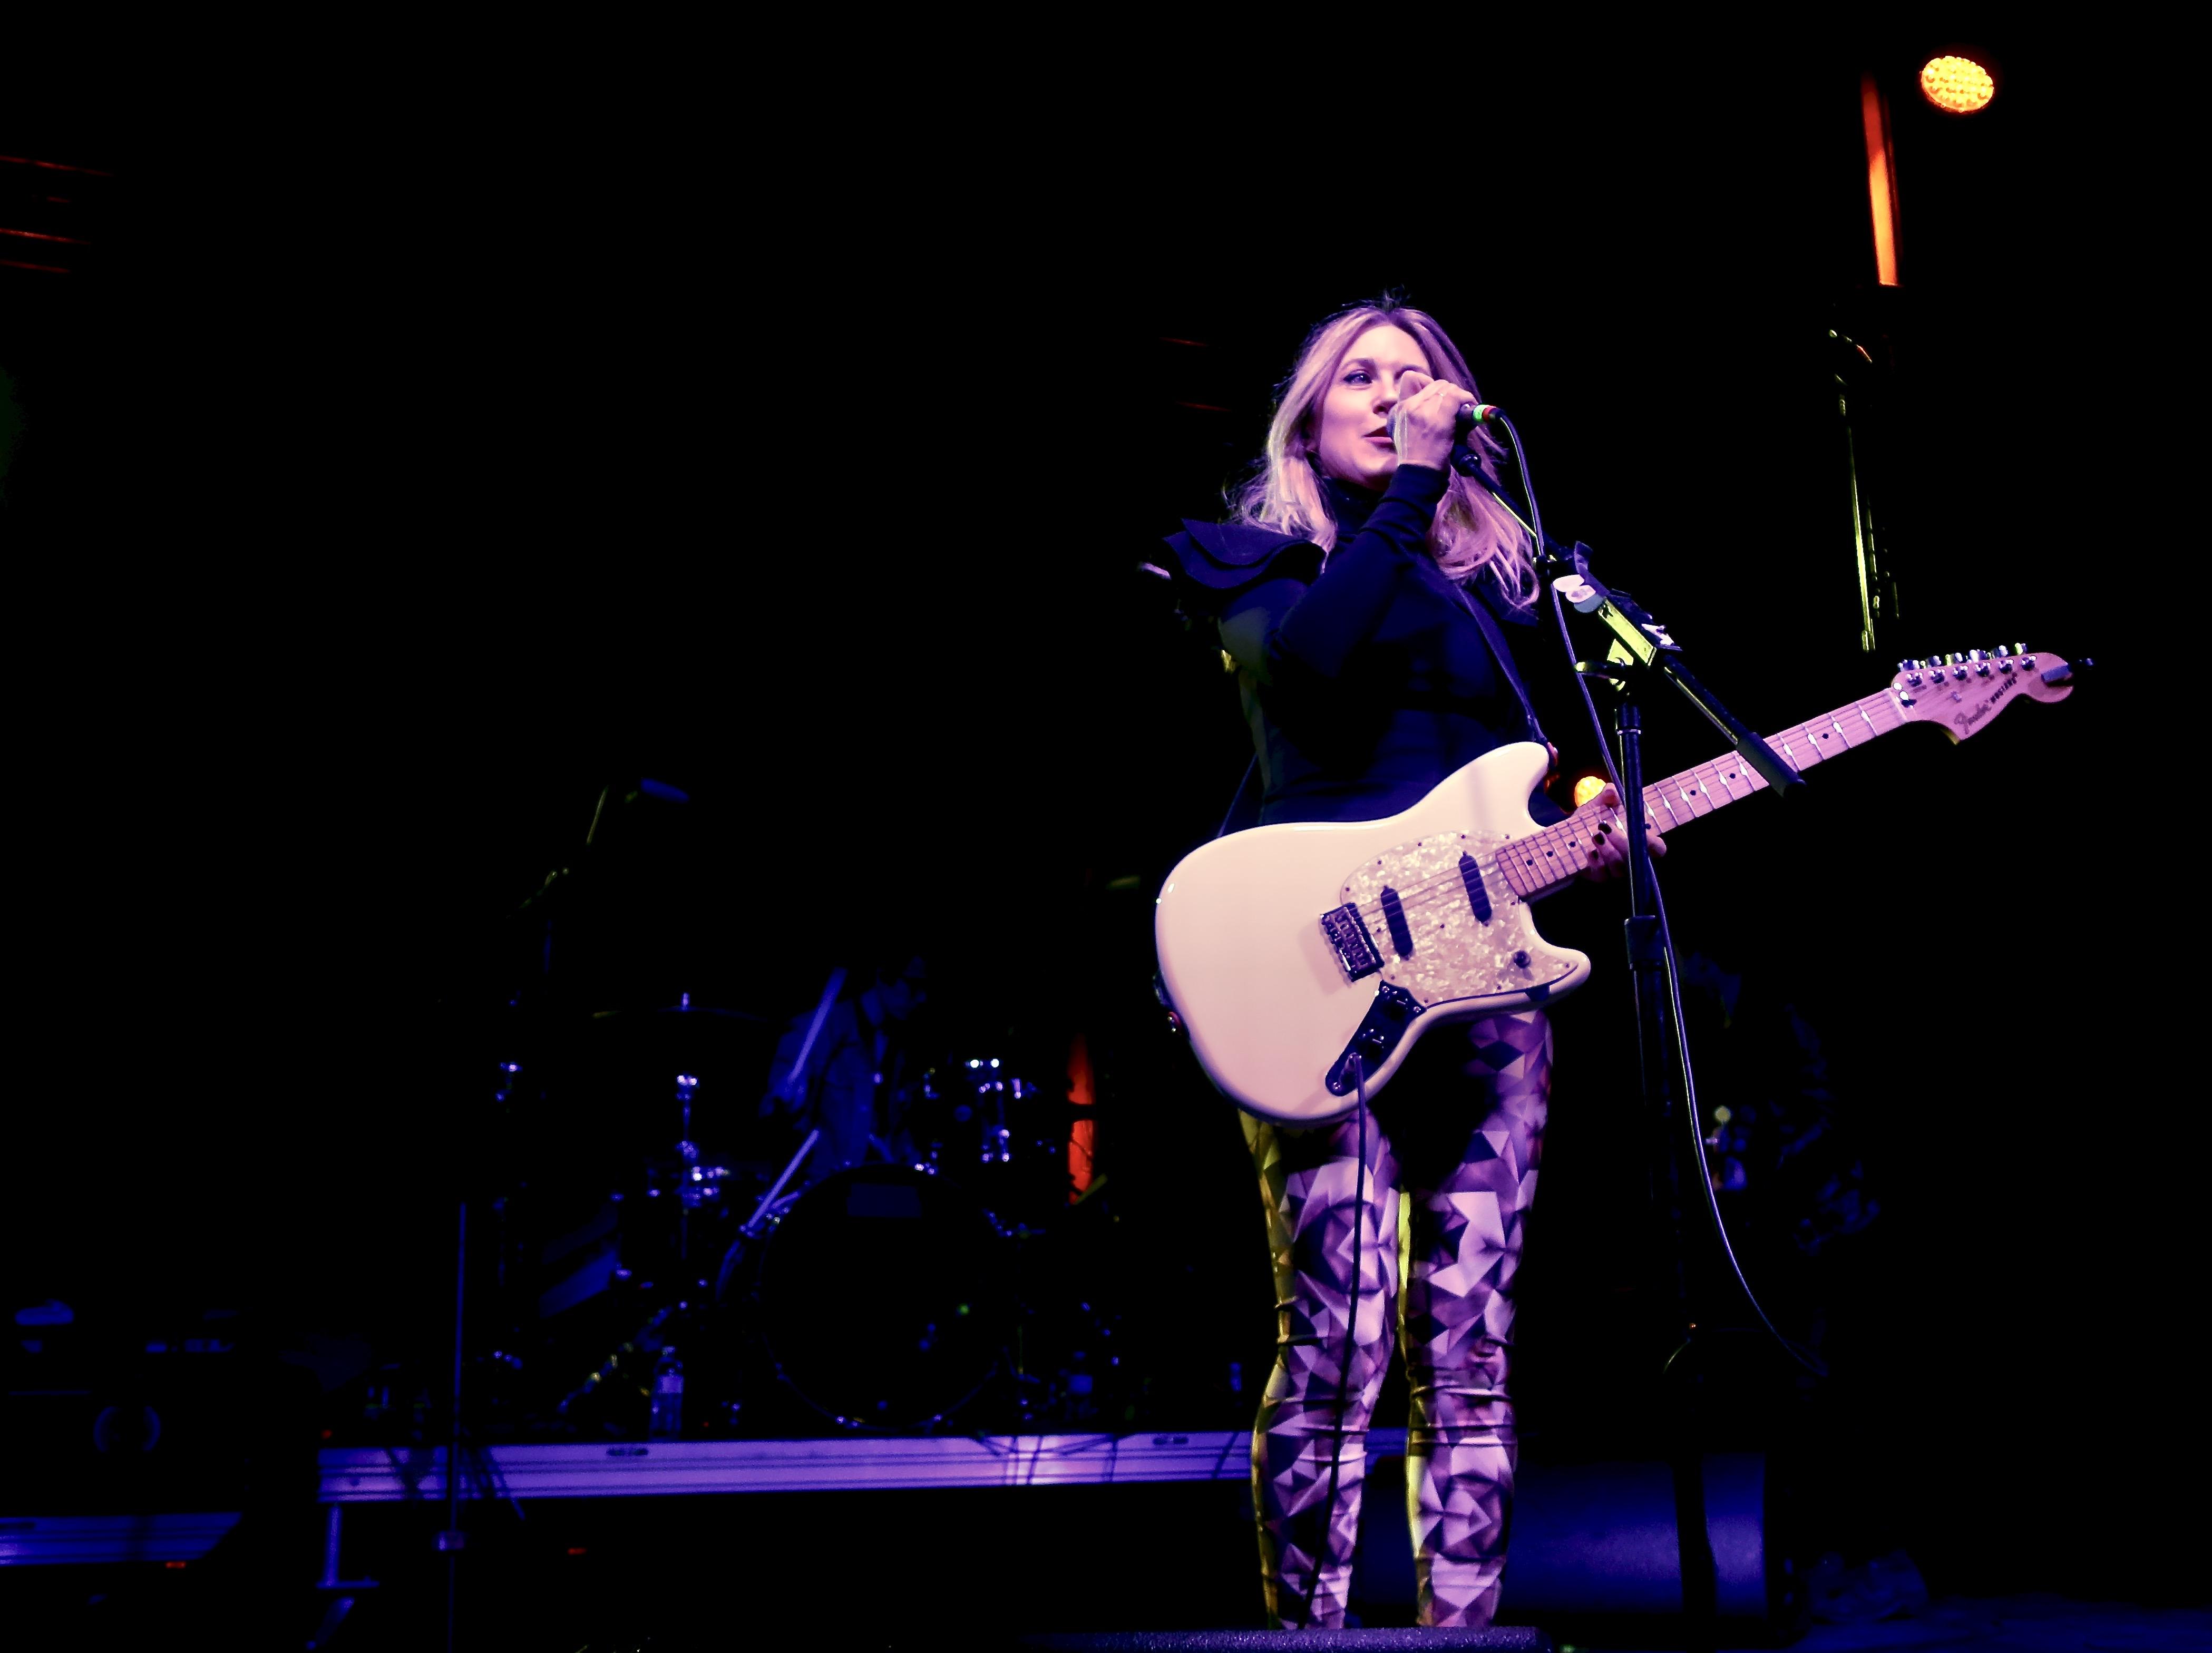 Liz Phair headlined on one night at the 2019 Treefort Music Fest.